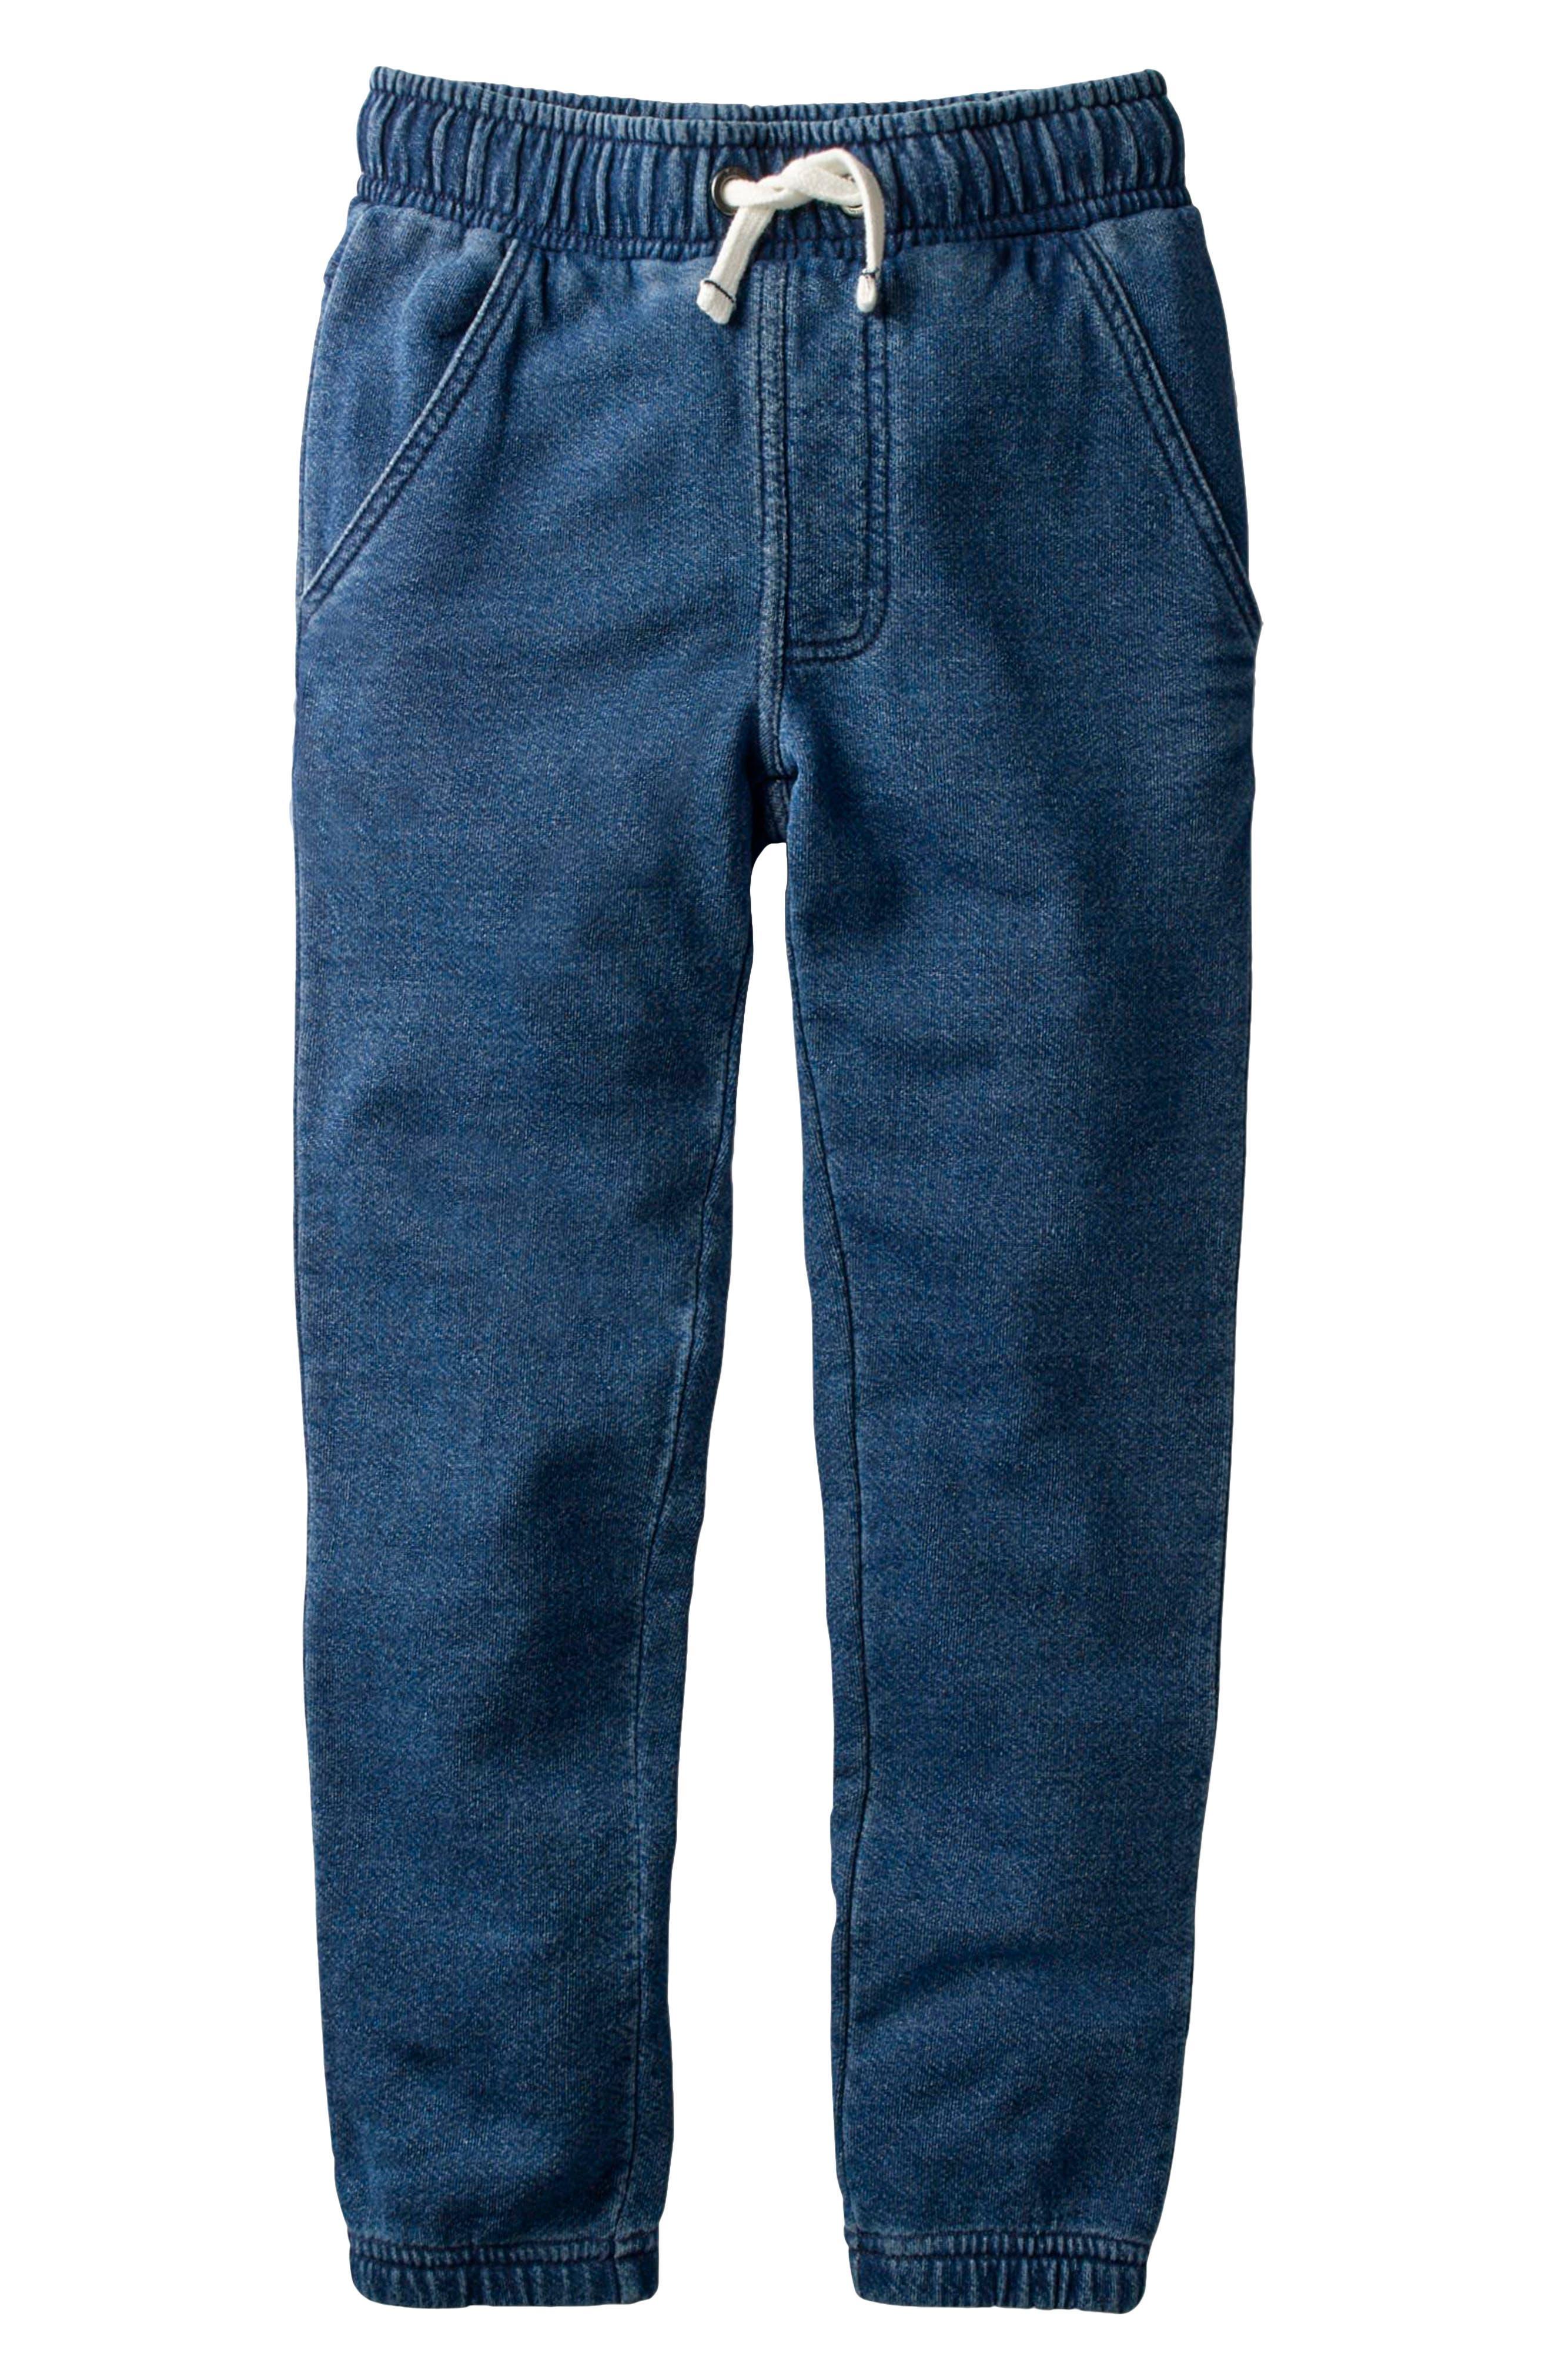 Jogger Pants,                             Main thumbnail 1, color,                             Indigo Blue